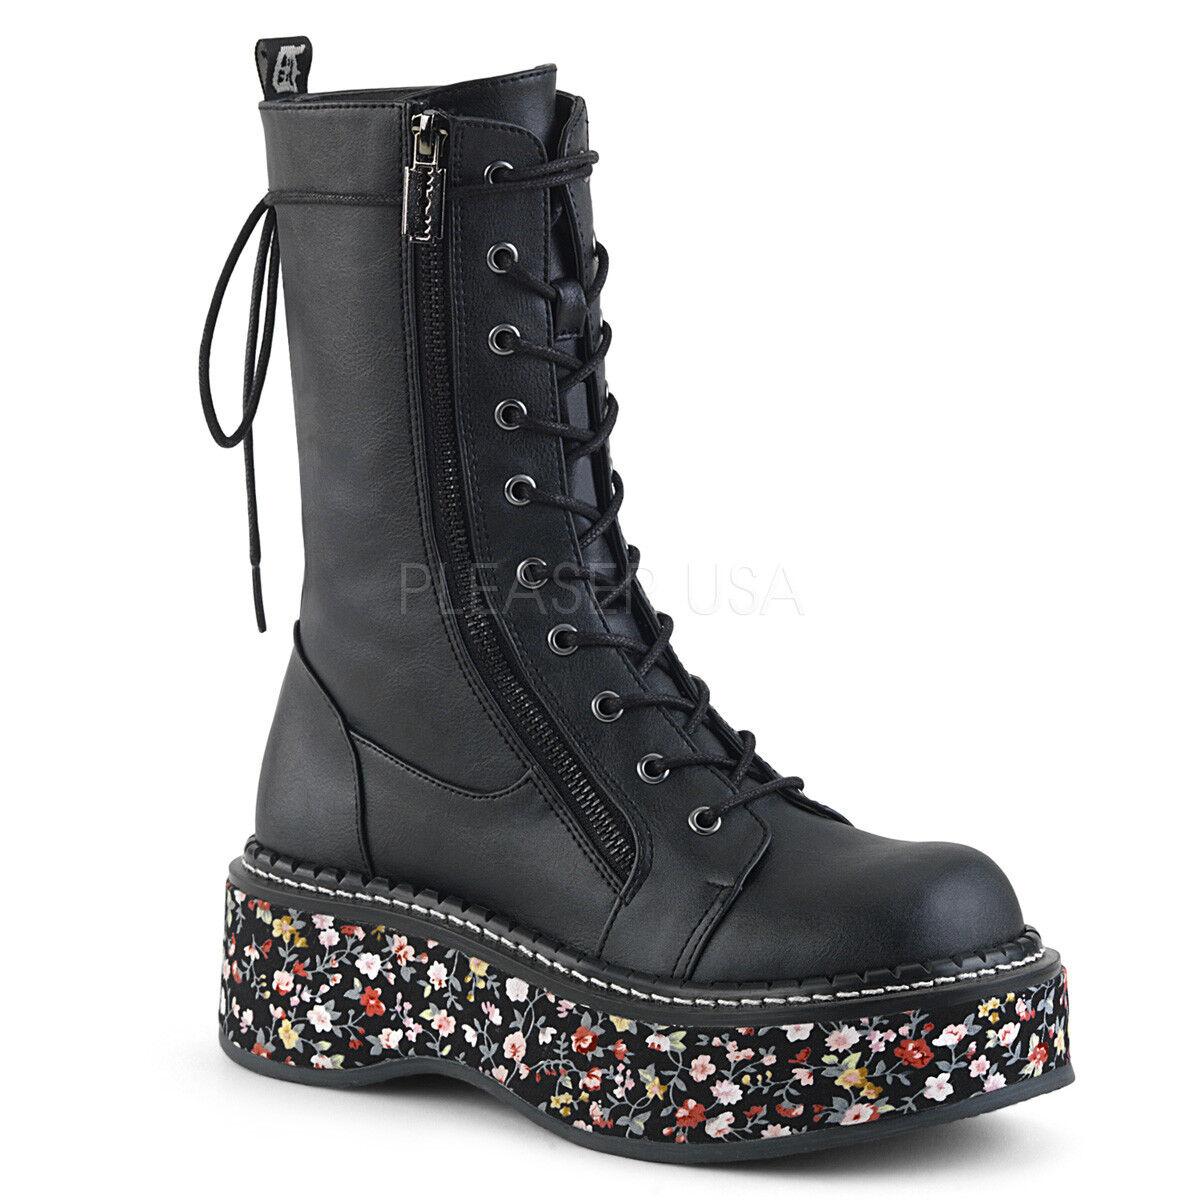 Demonia Vegano Negro Negro Negro 2  plataforma 10 Ojo Floral Suela botas De Becerro Razor Punk 6-12  El ultimo 2018